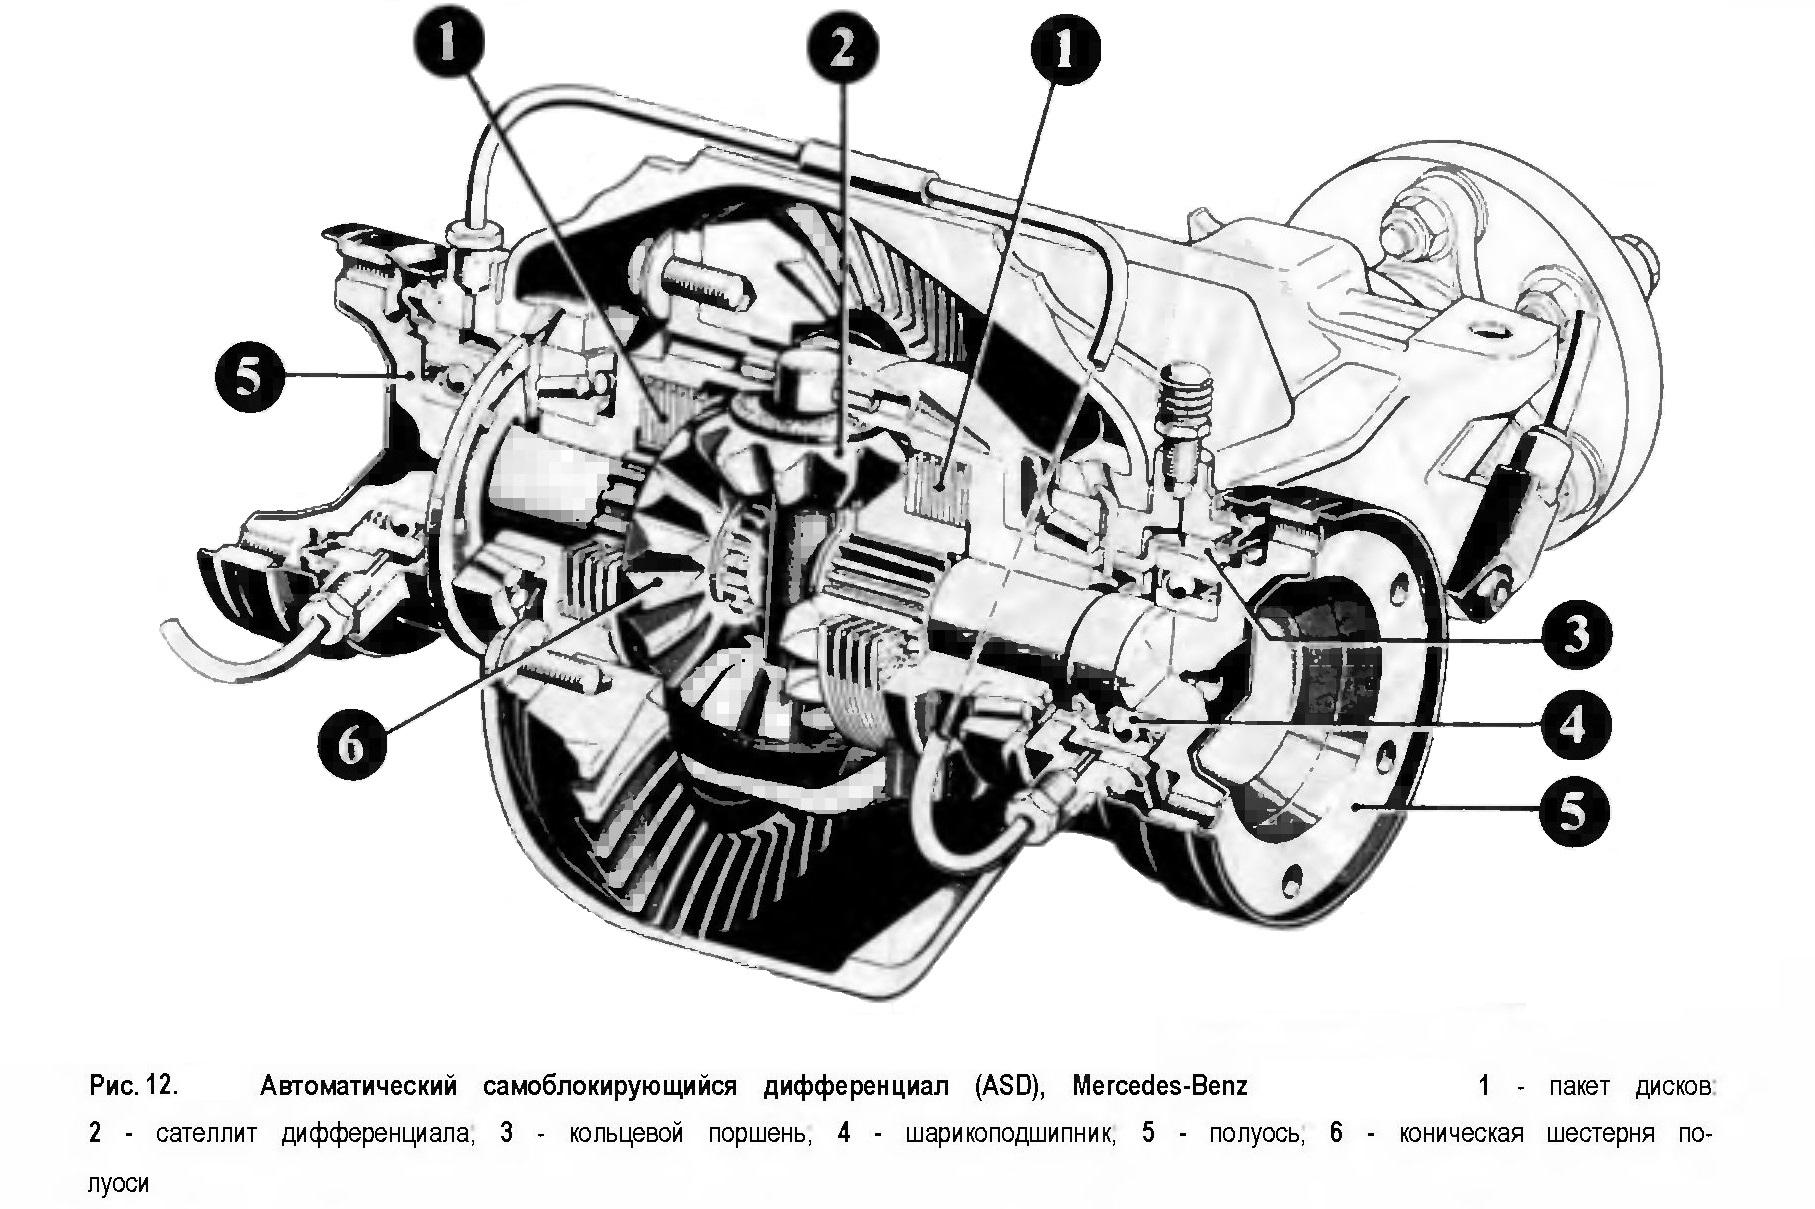 Автоматический самоблокирующийся дифференциал (ASD), Mercedes-Benz